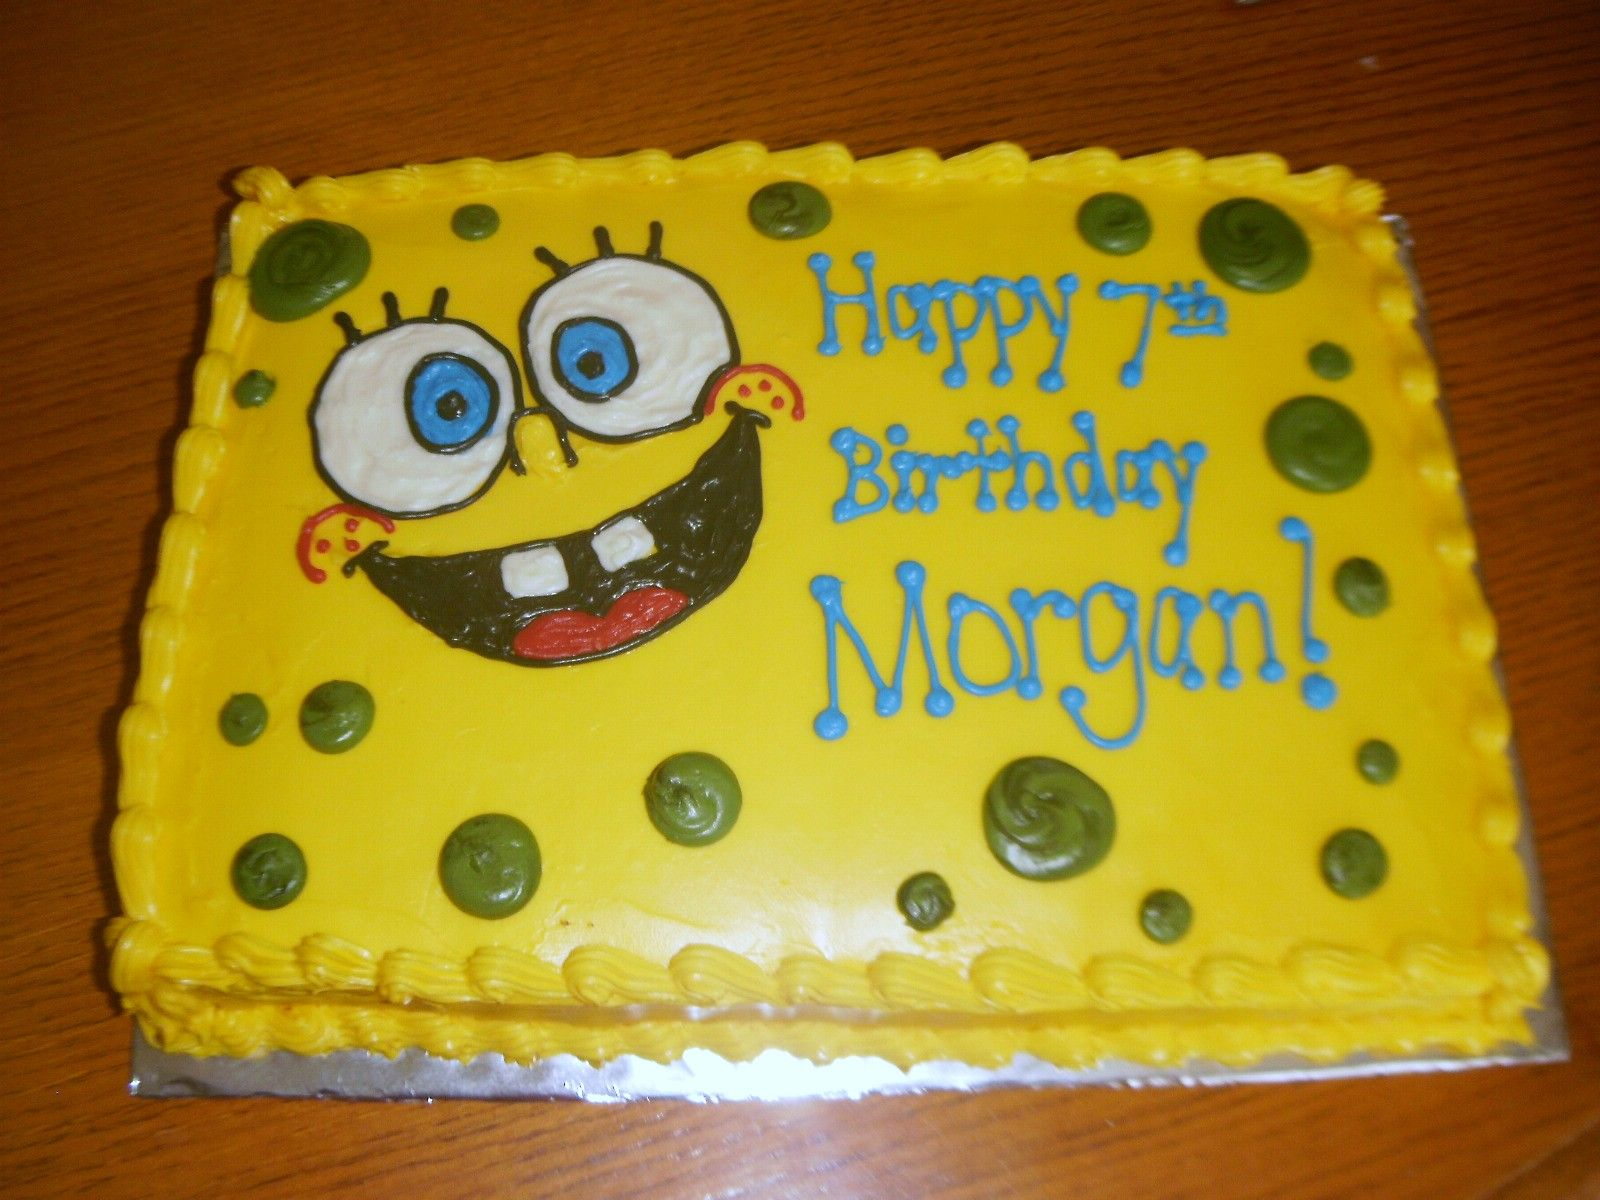 Spongebob Cake Plain And Simple With Images Spongebob